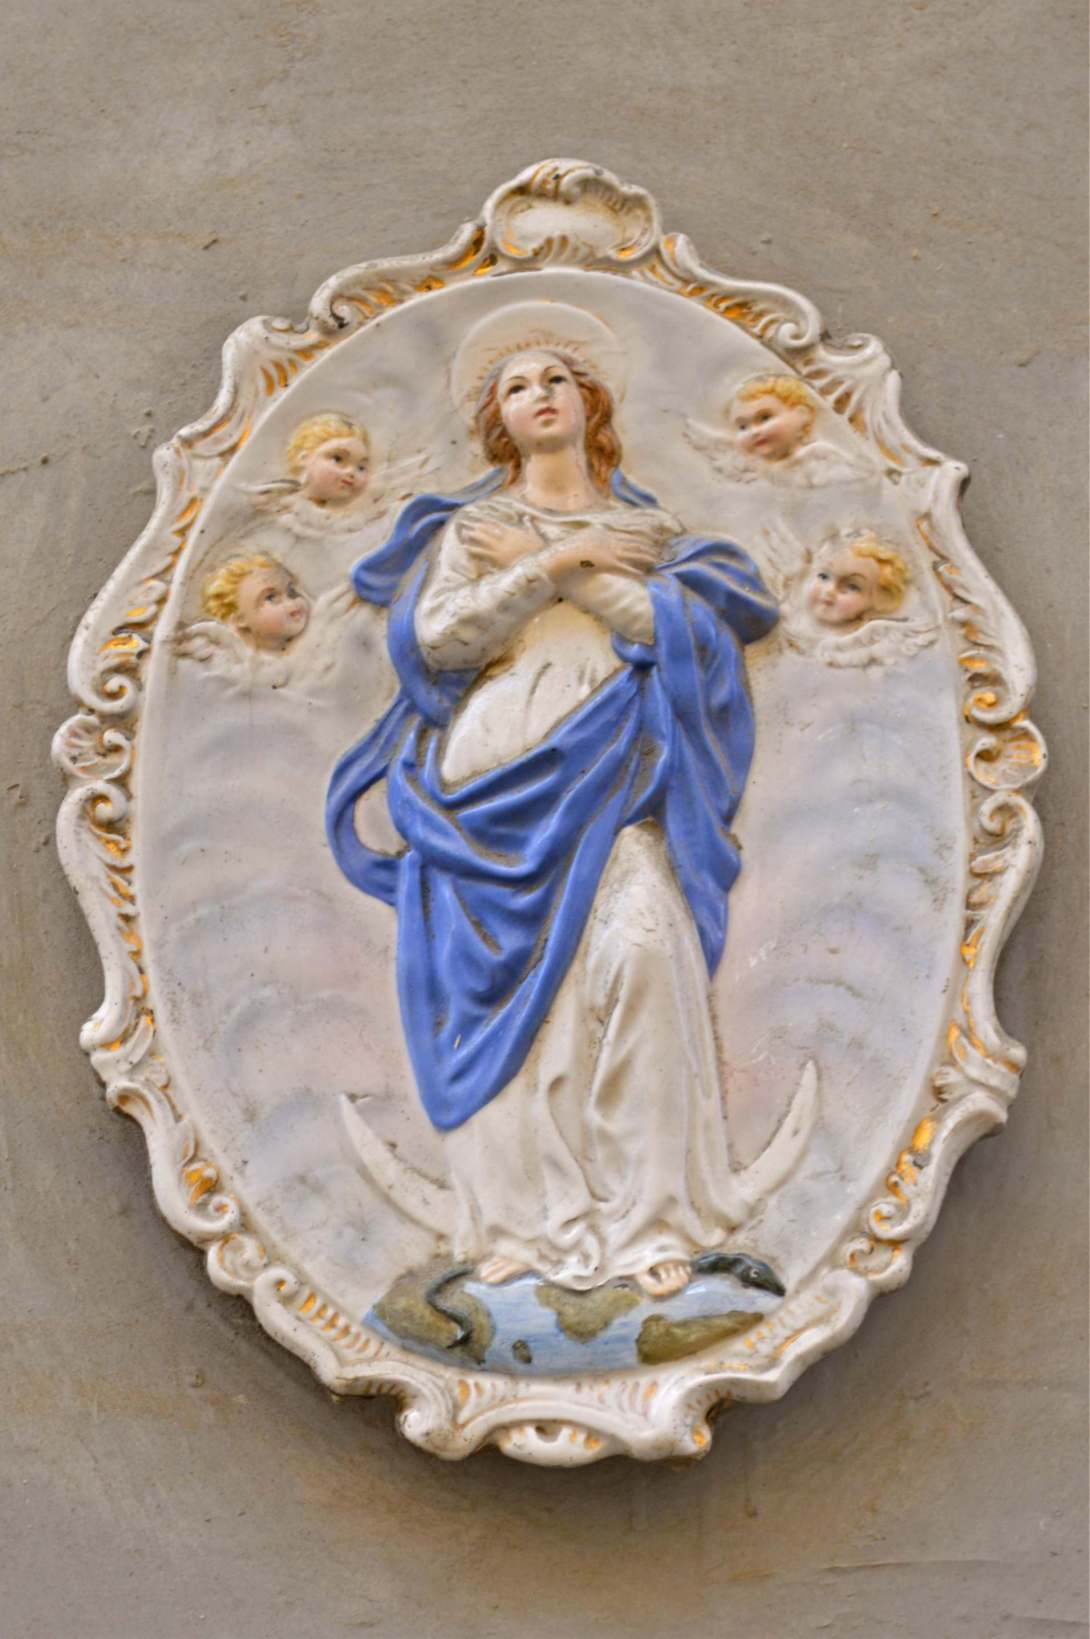 Maria Statuen auf Malta